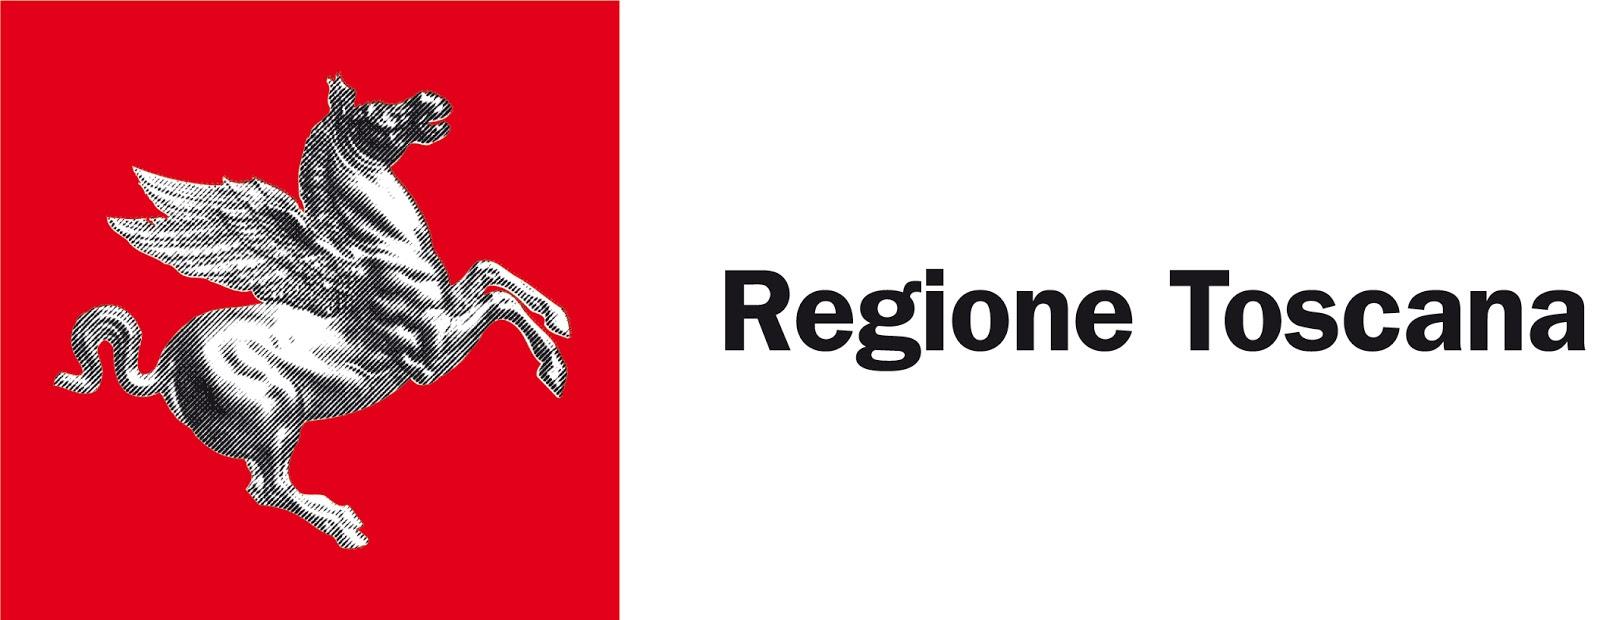 Regione Toscana scoop